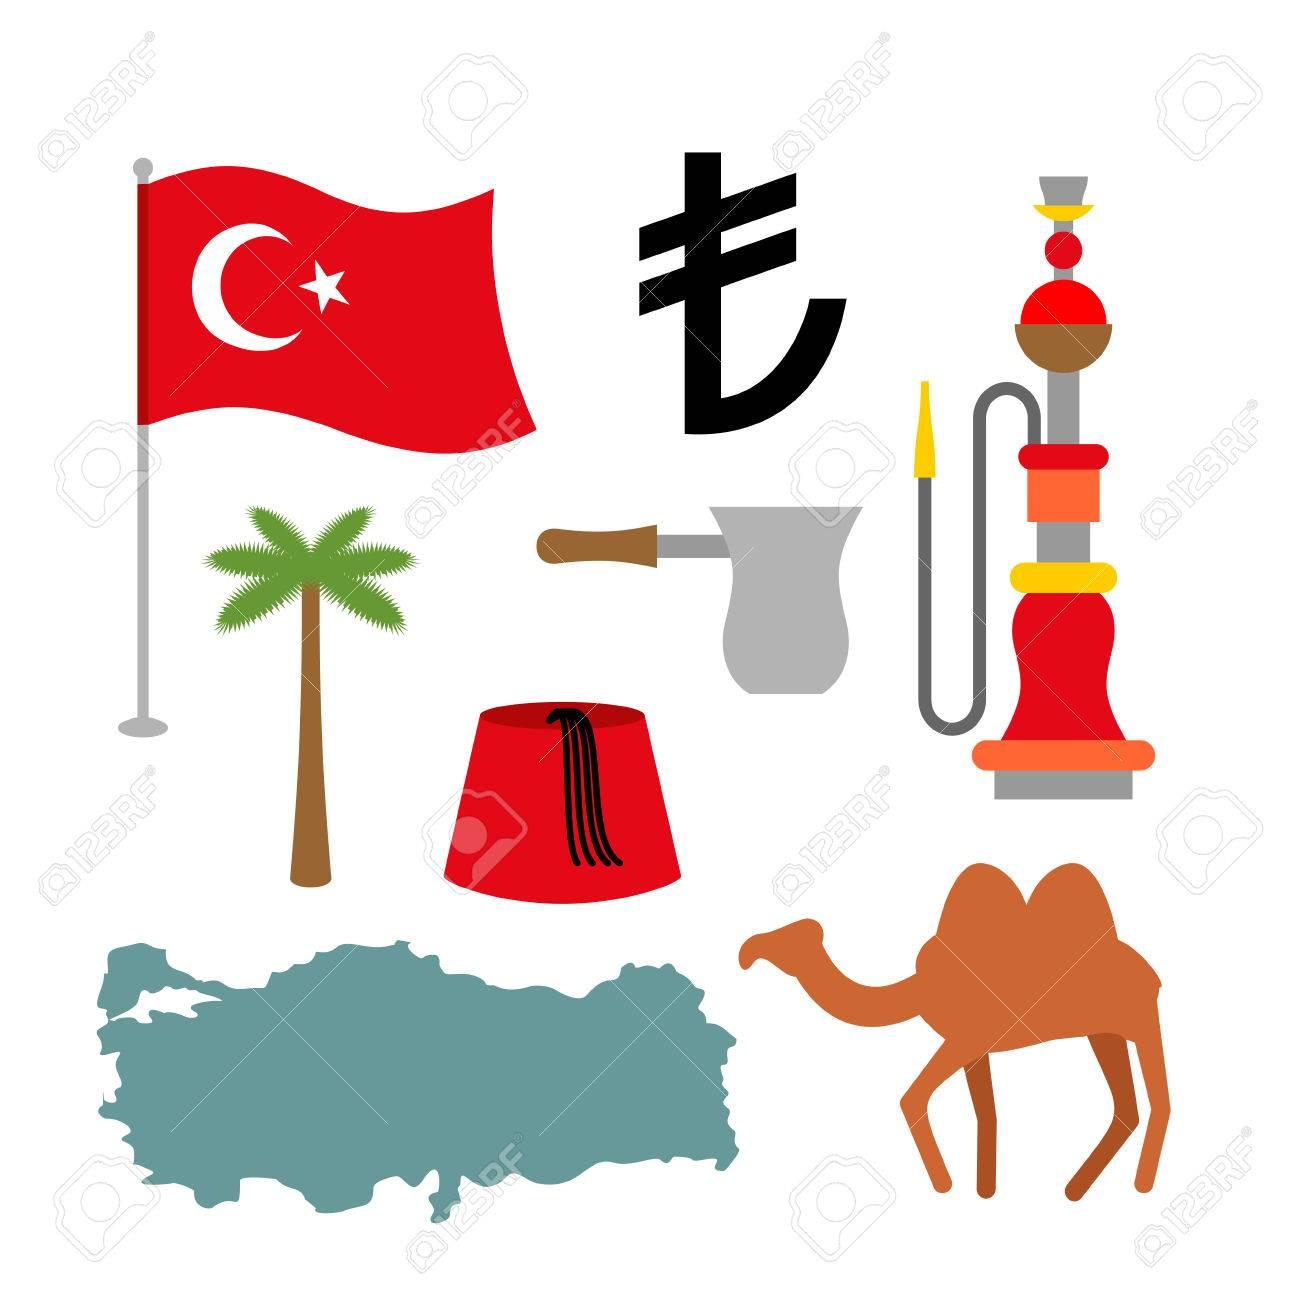 Turkey symbol set turkish national icon state traditional sign turkey symbol set turkish national icon state traditional sign map and flag of biocorpaavc Images